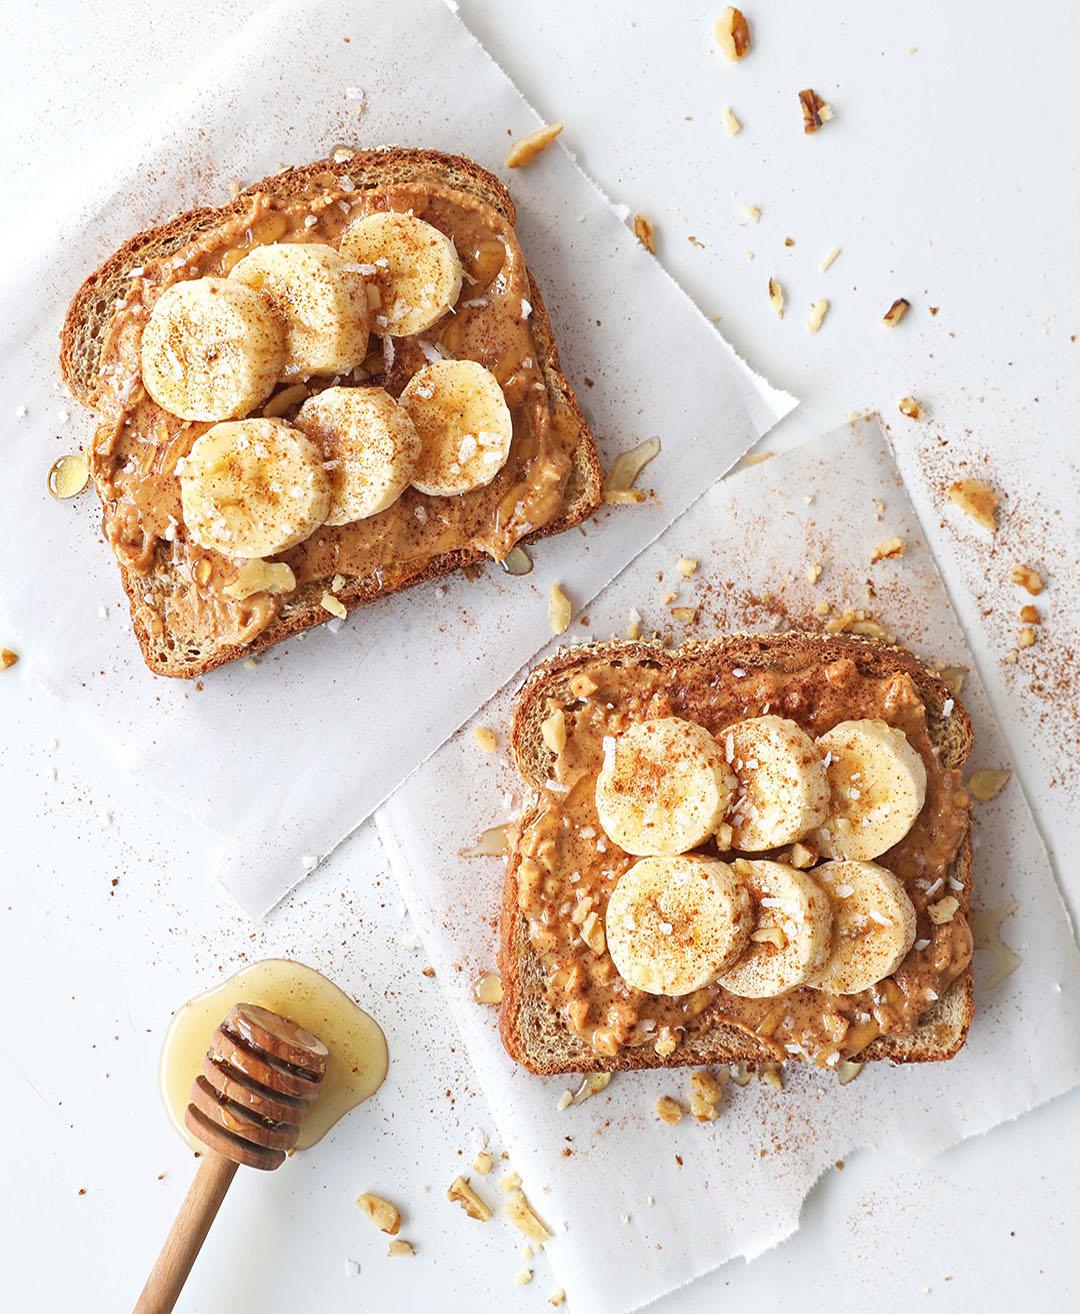 Peanut-Butter-Toast-maha-munaf.jpg